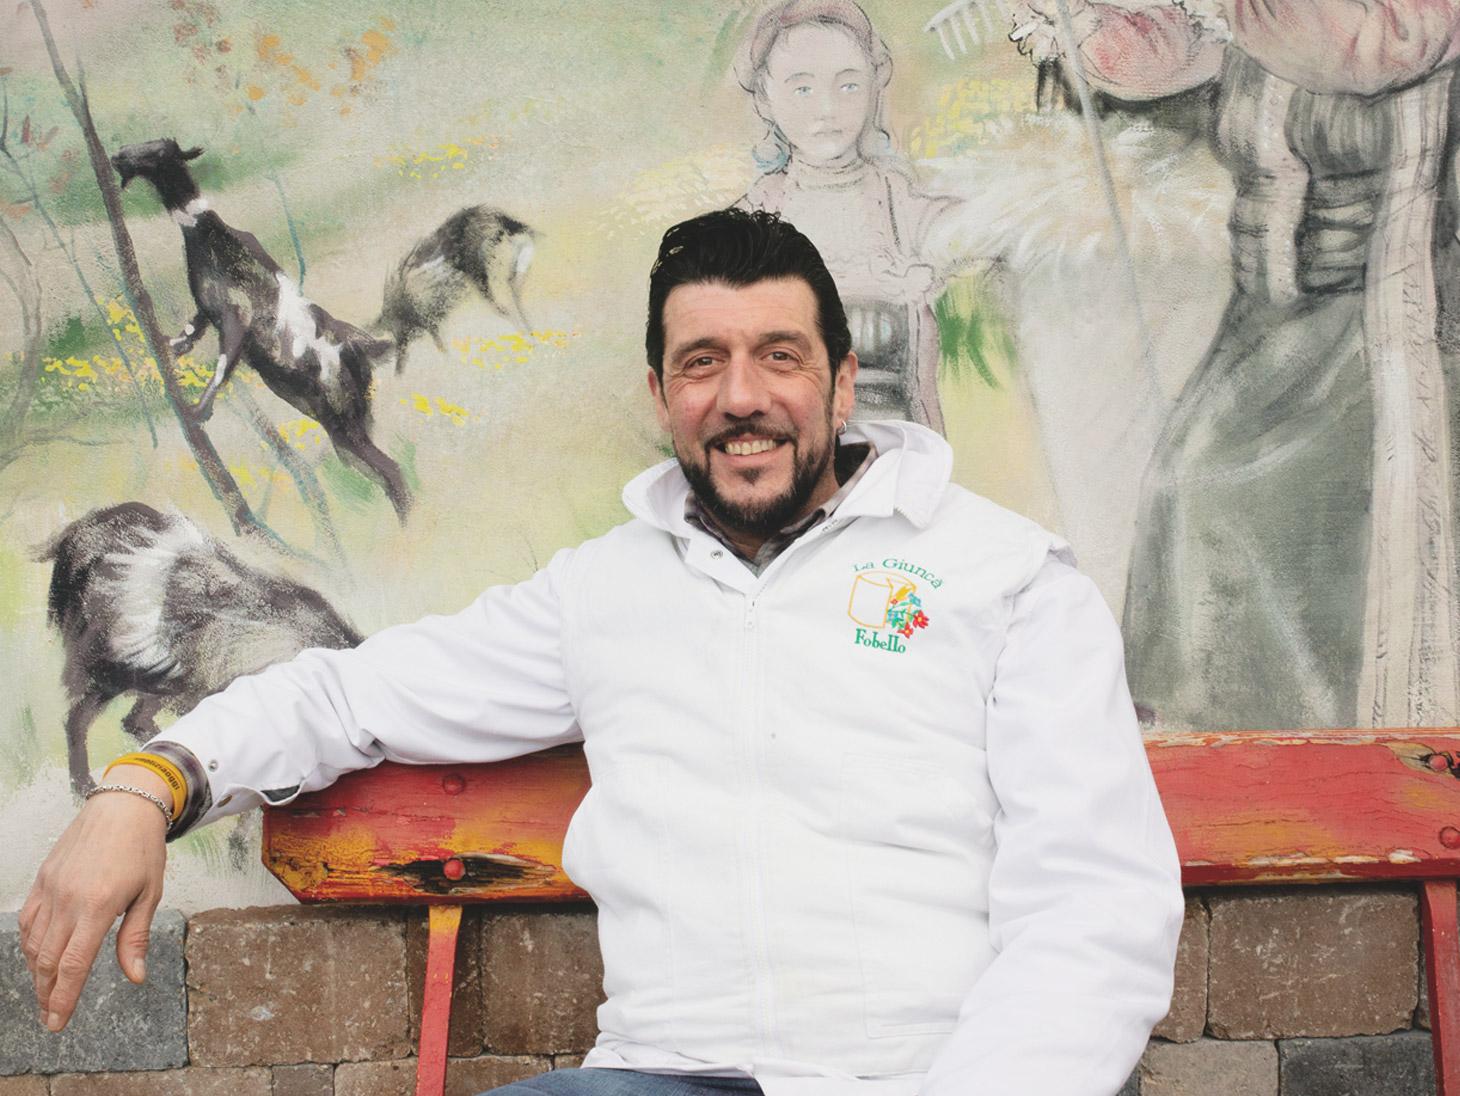 Gianluca Bacchella - La Giuncà